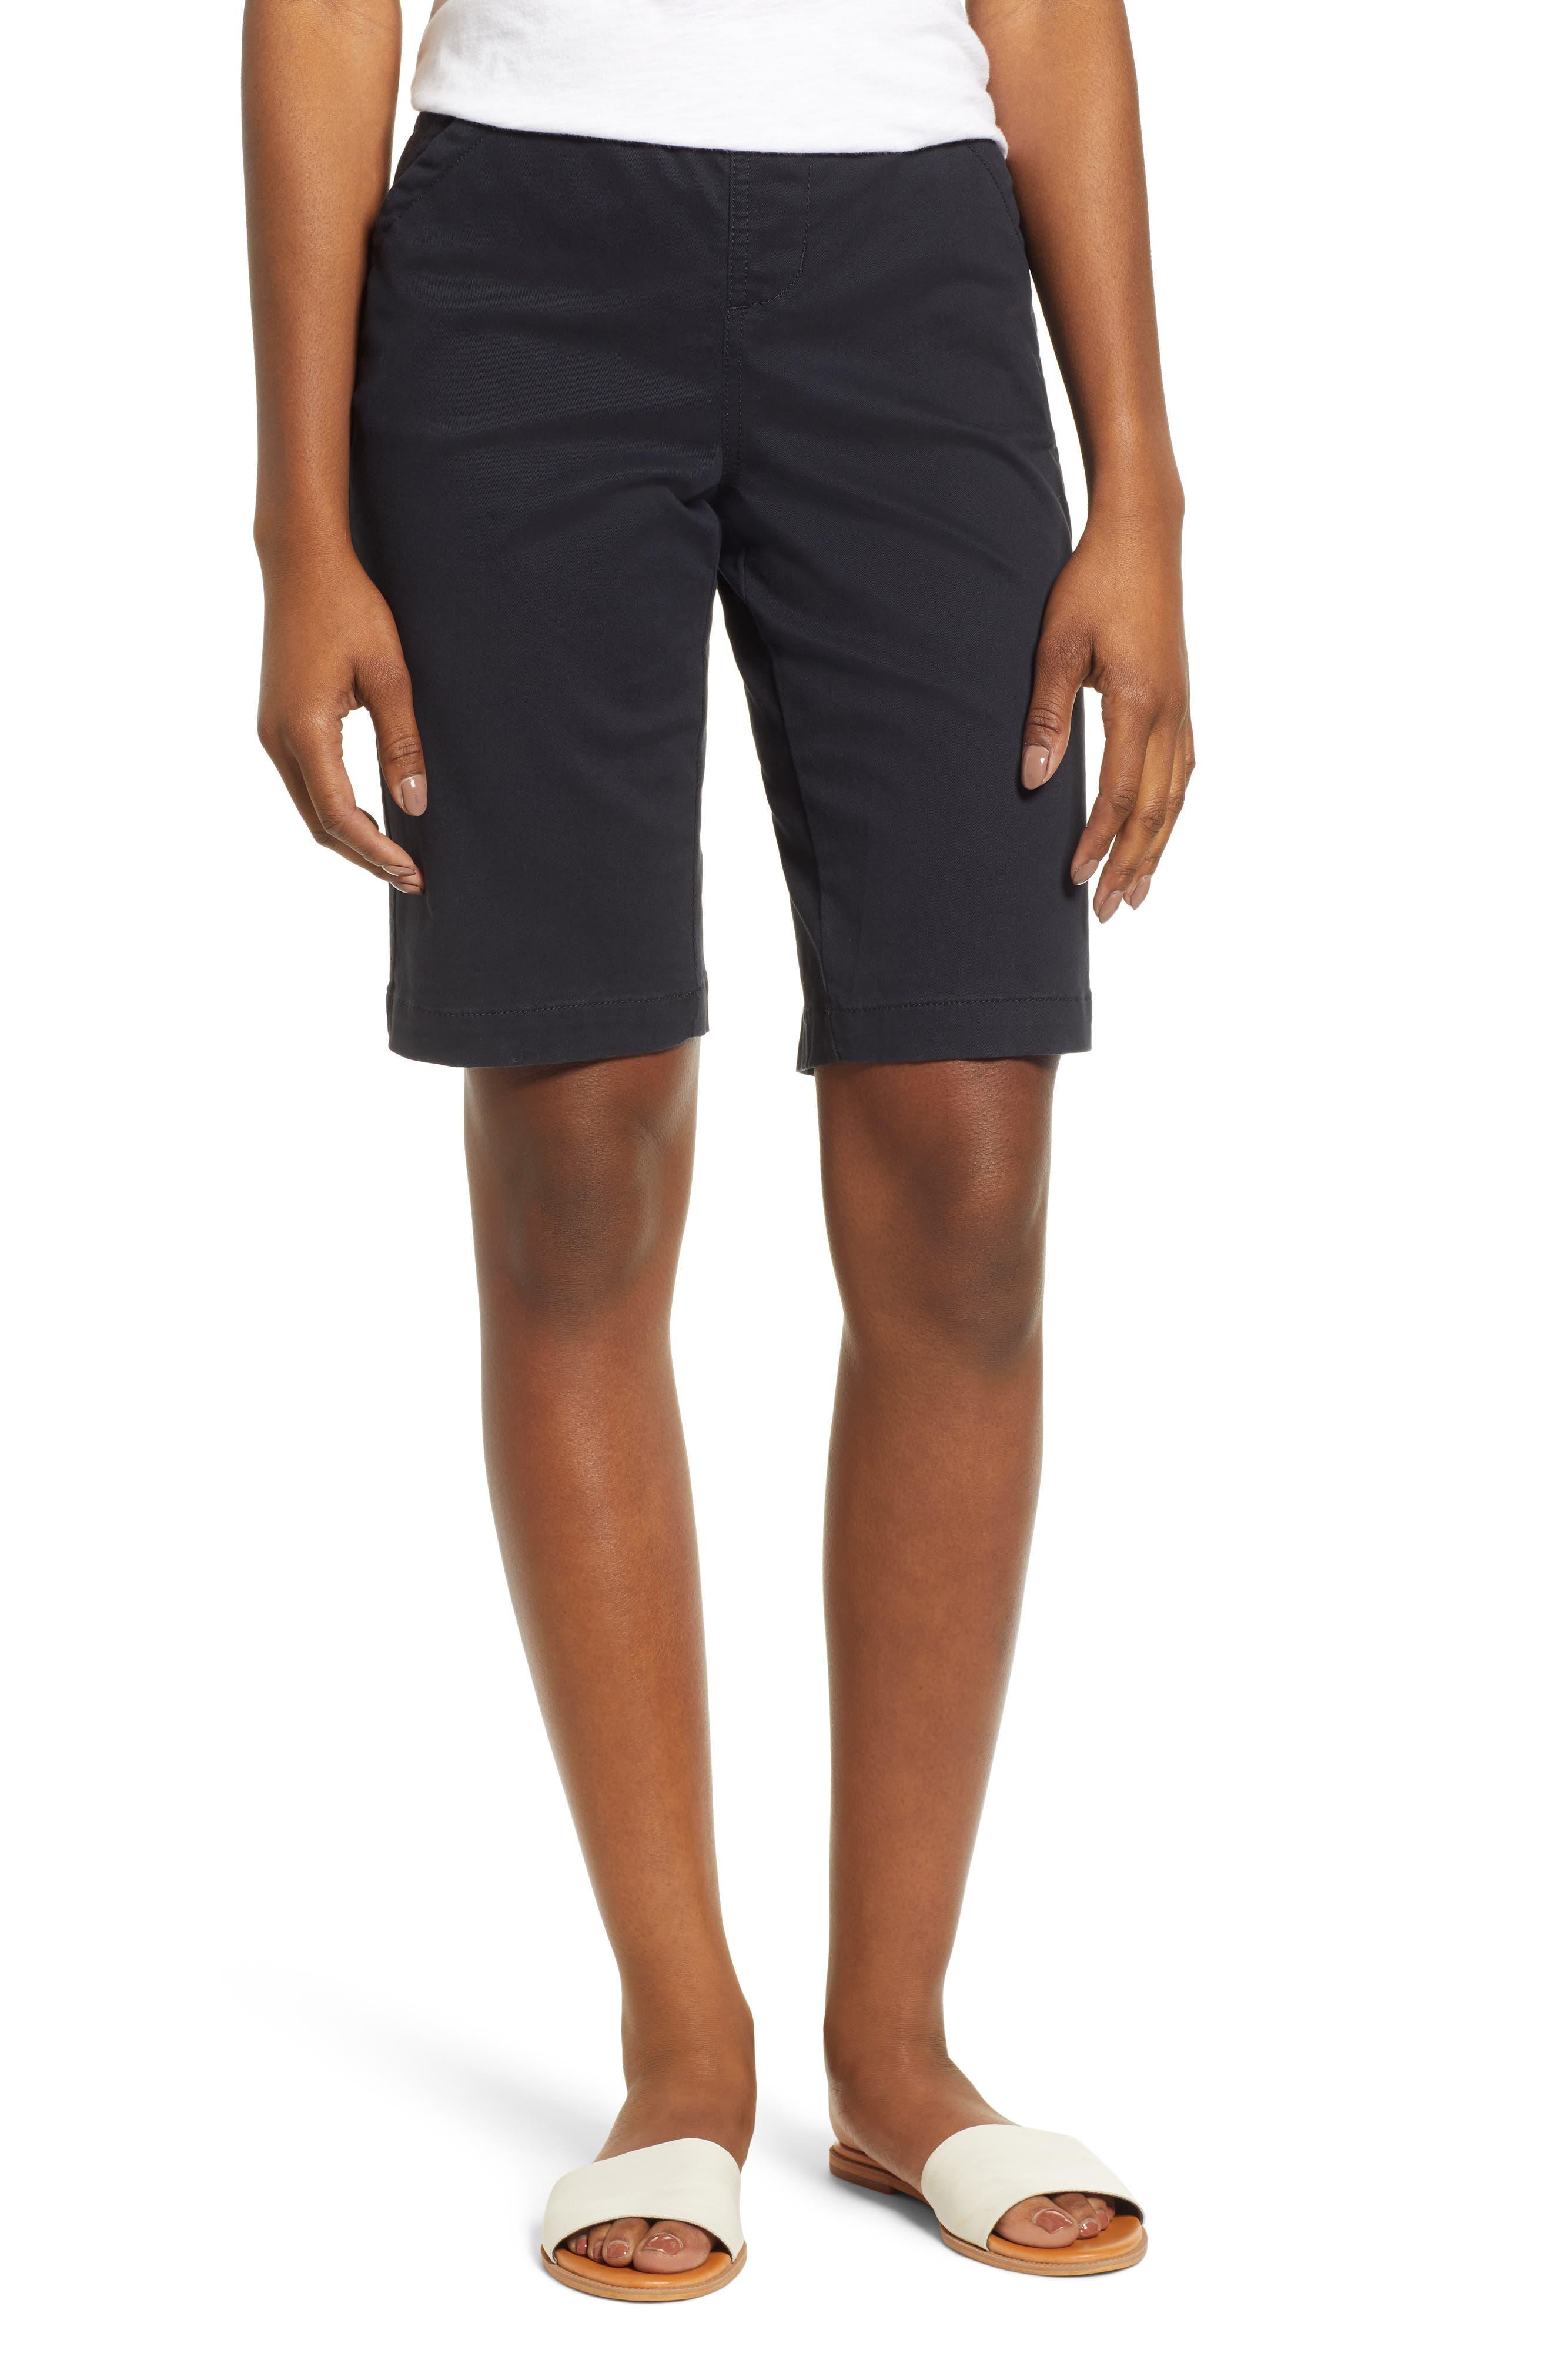 JAG JEANS Gracie Bermuda Shorts, Main, color, BLACK